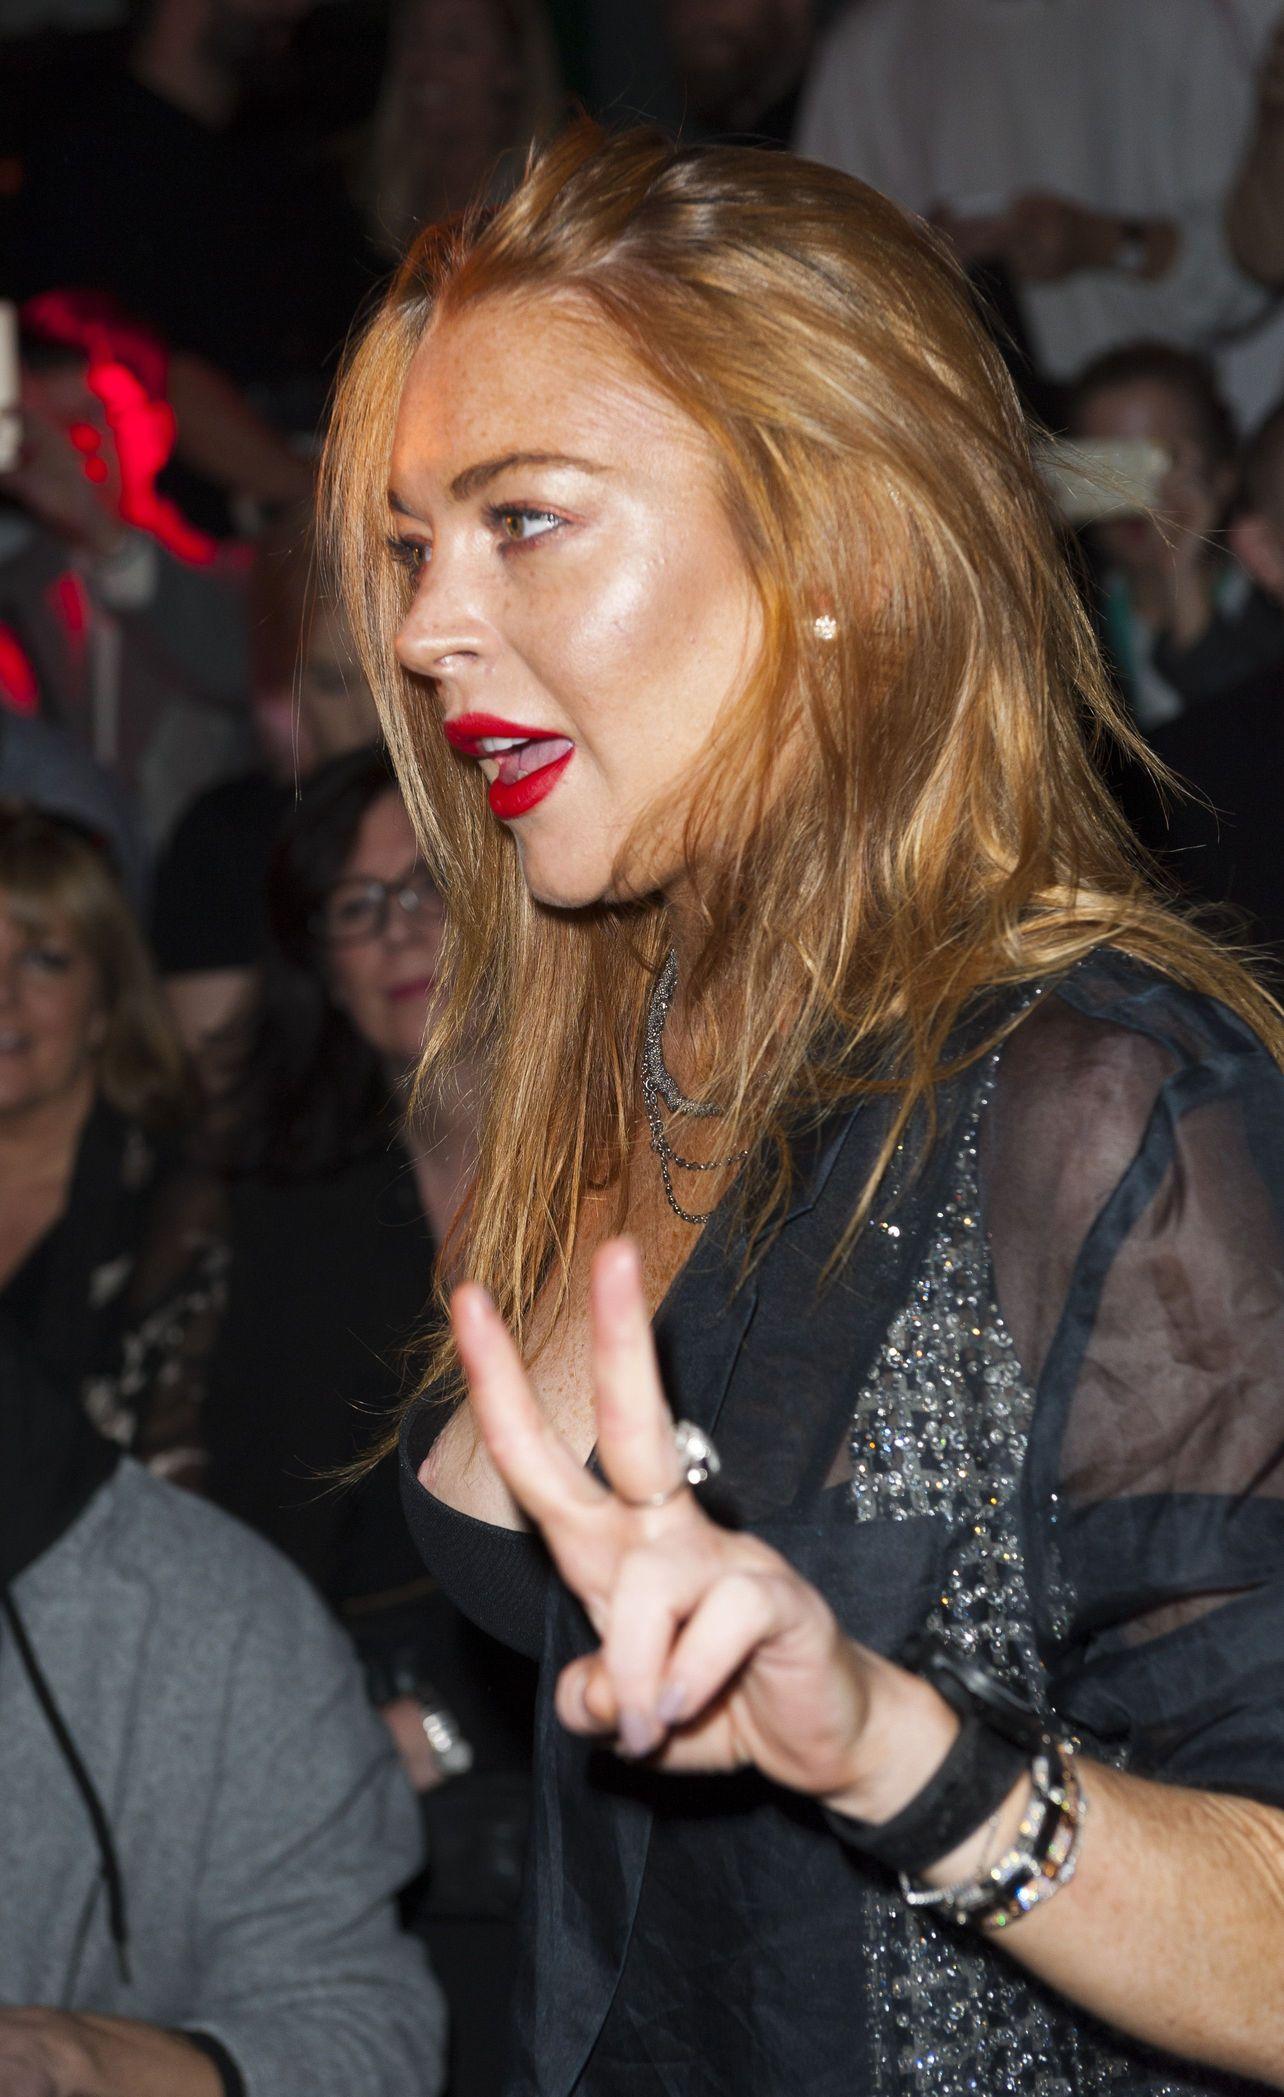 Lindsay Lohan Nipple Slip (20 Photos)